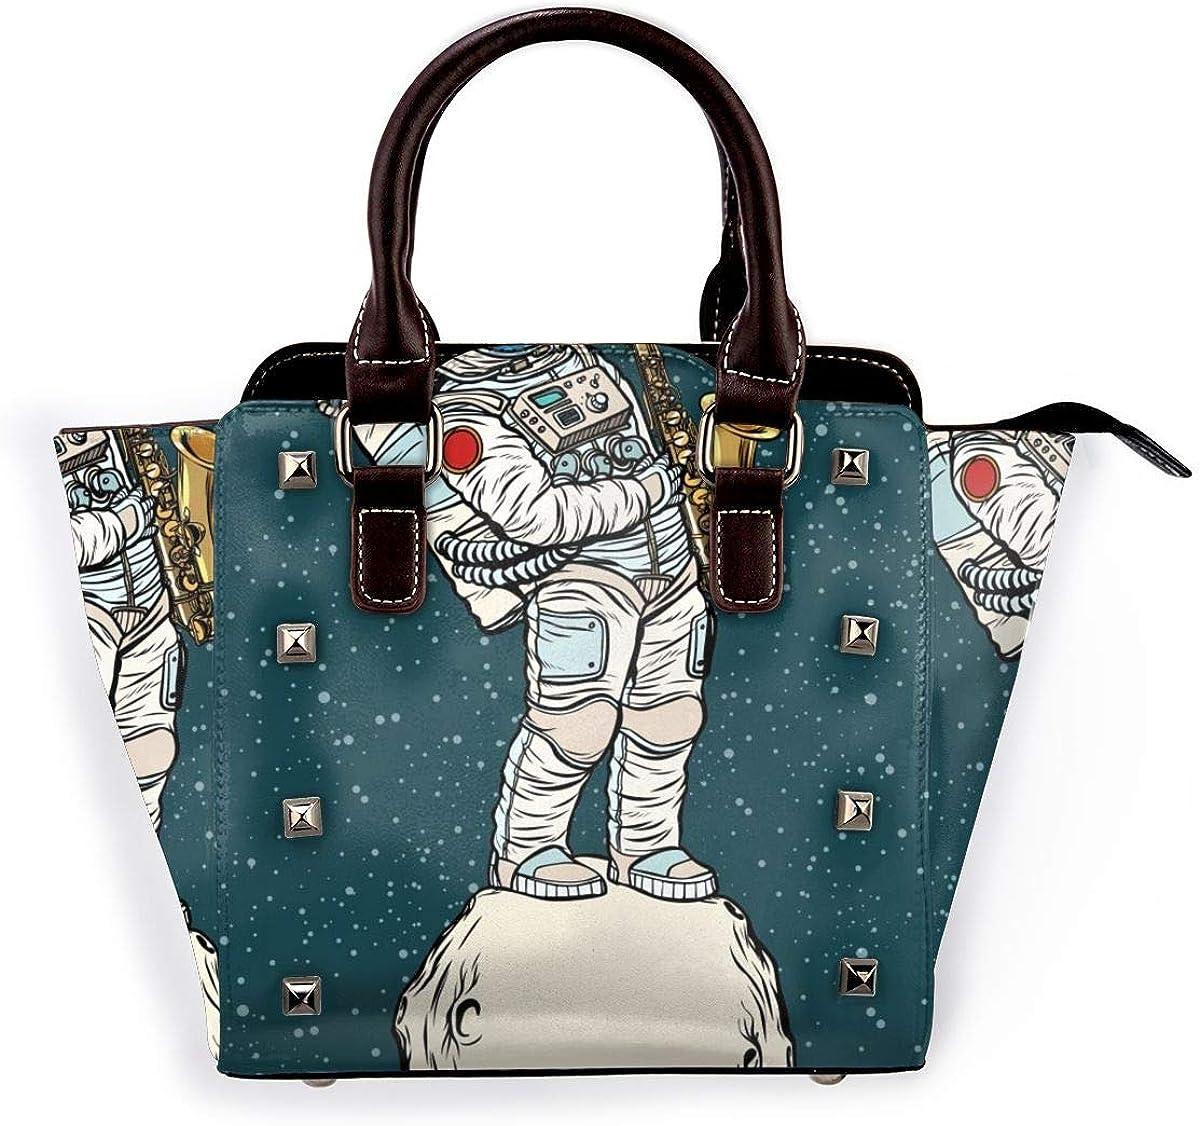 Magia Wolf Atrapasueños Mujer Moda Cuero Genuino Remache Bolso de Hombro Chicas de Viaje Escuela Bolso de mano Saxofón Astronauta Espacial